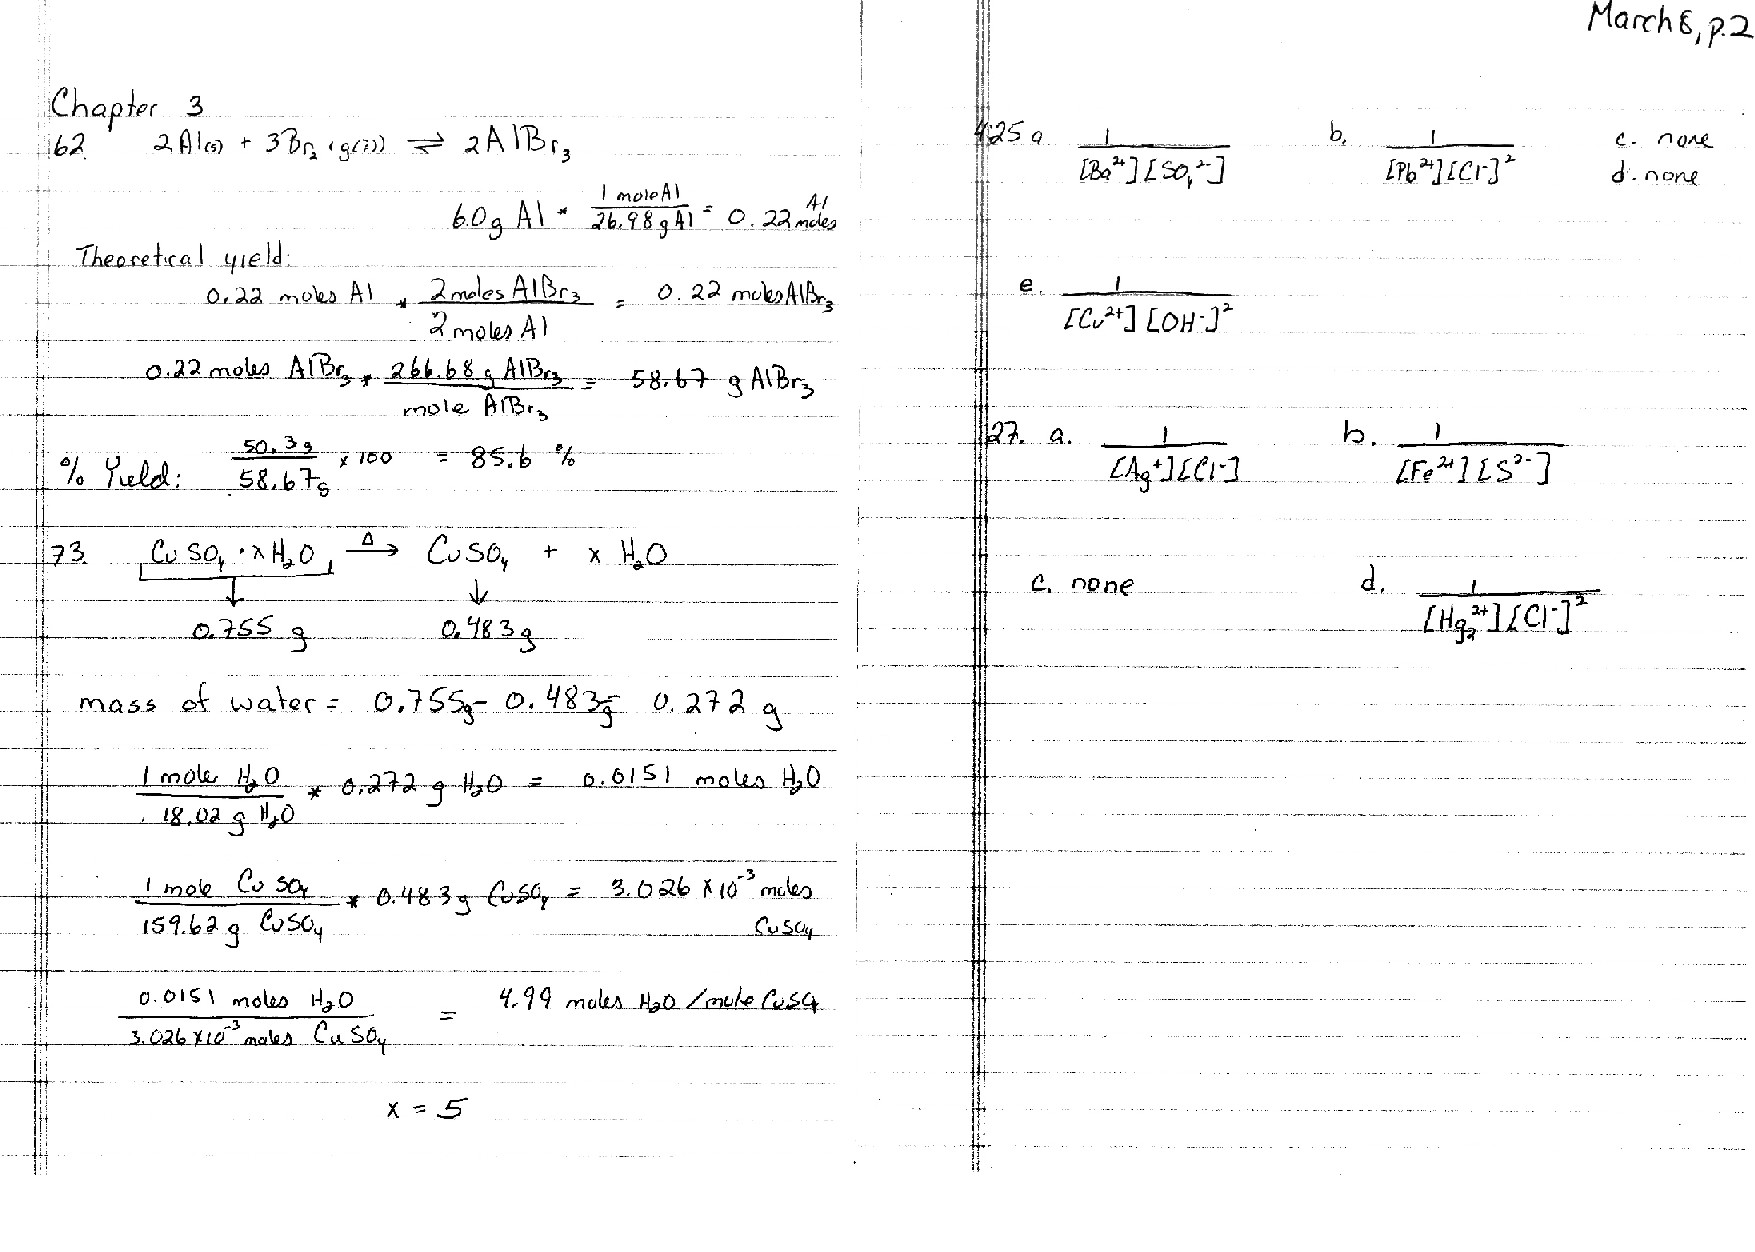 Engineering Chemistry Ii Schedule